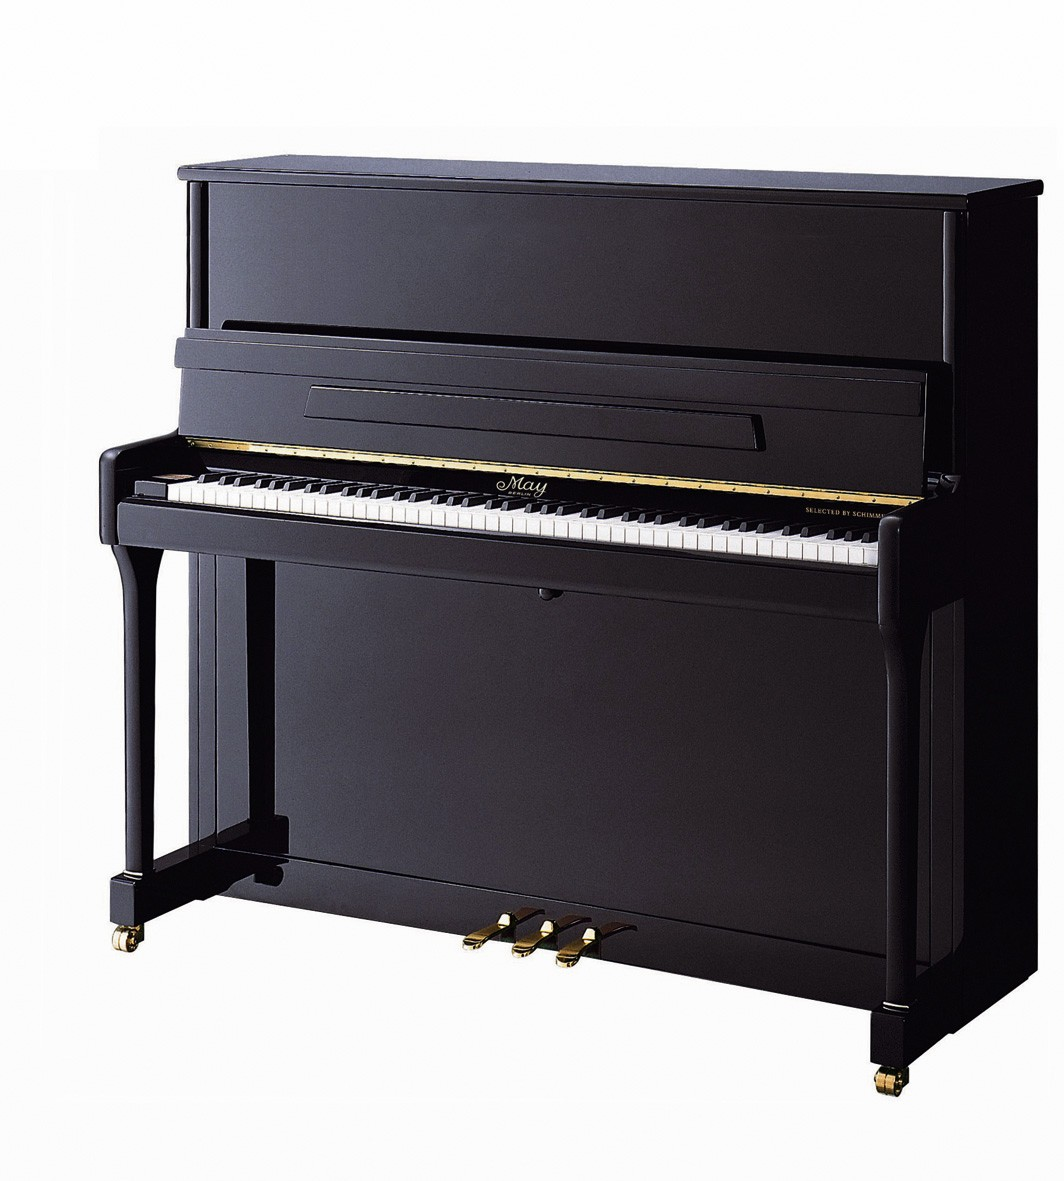 le piano instrument musique. Black Bedroom Furniture Sets. Home Design Ideas